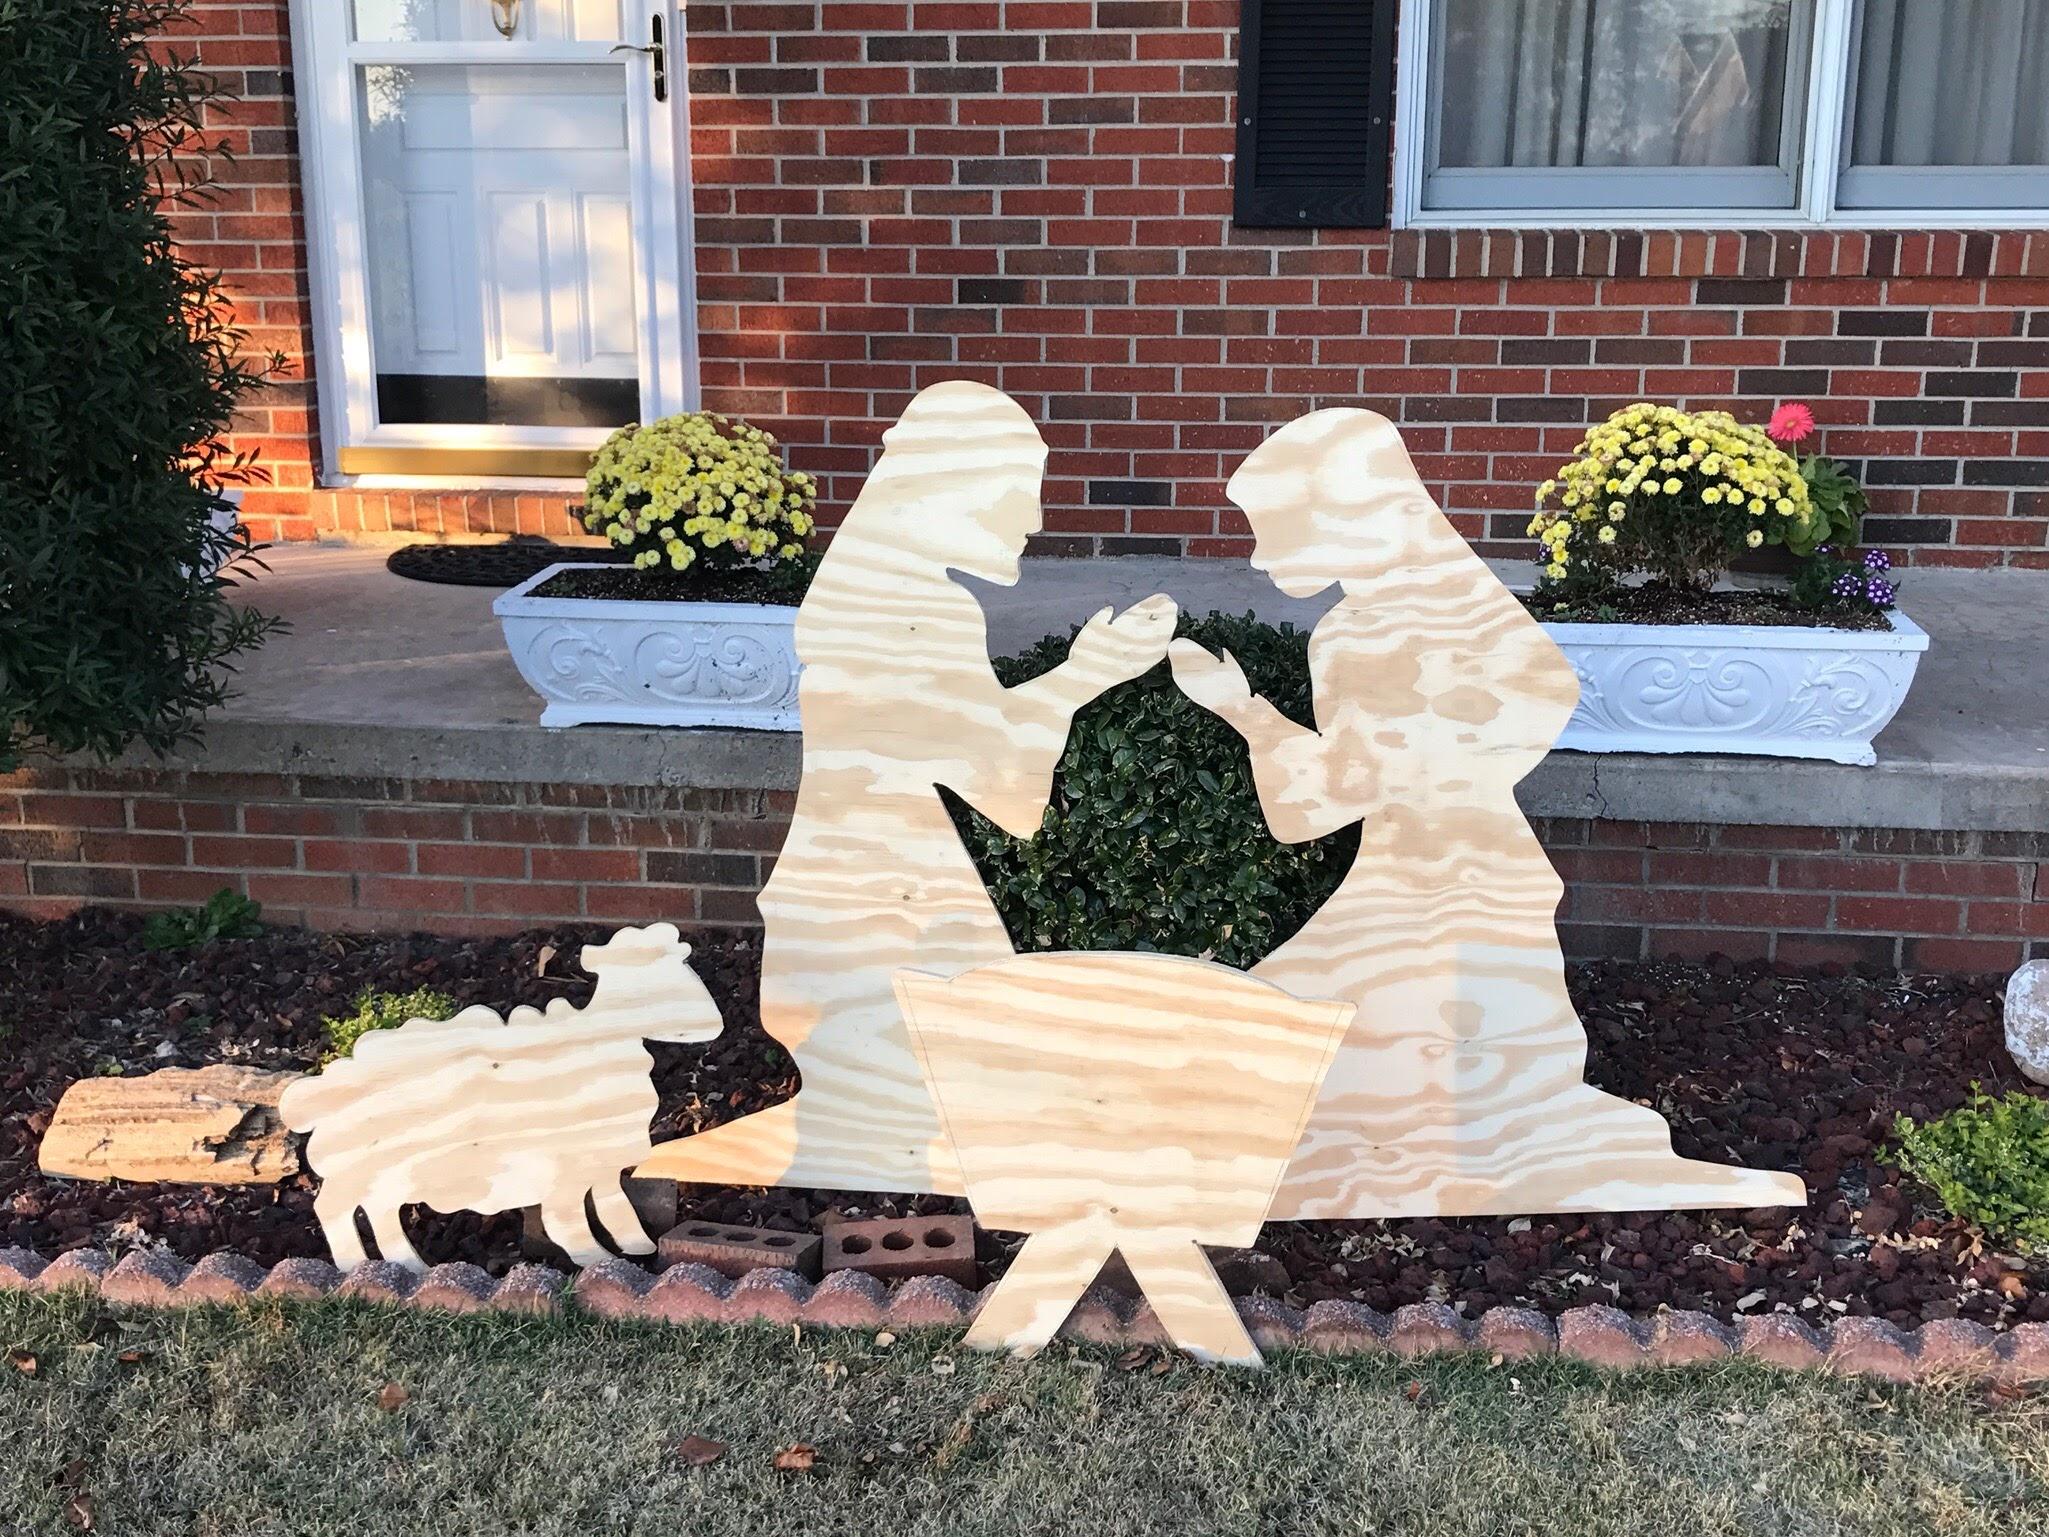 Plywood Nativity Scene + Cook Portable Warehouses